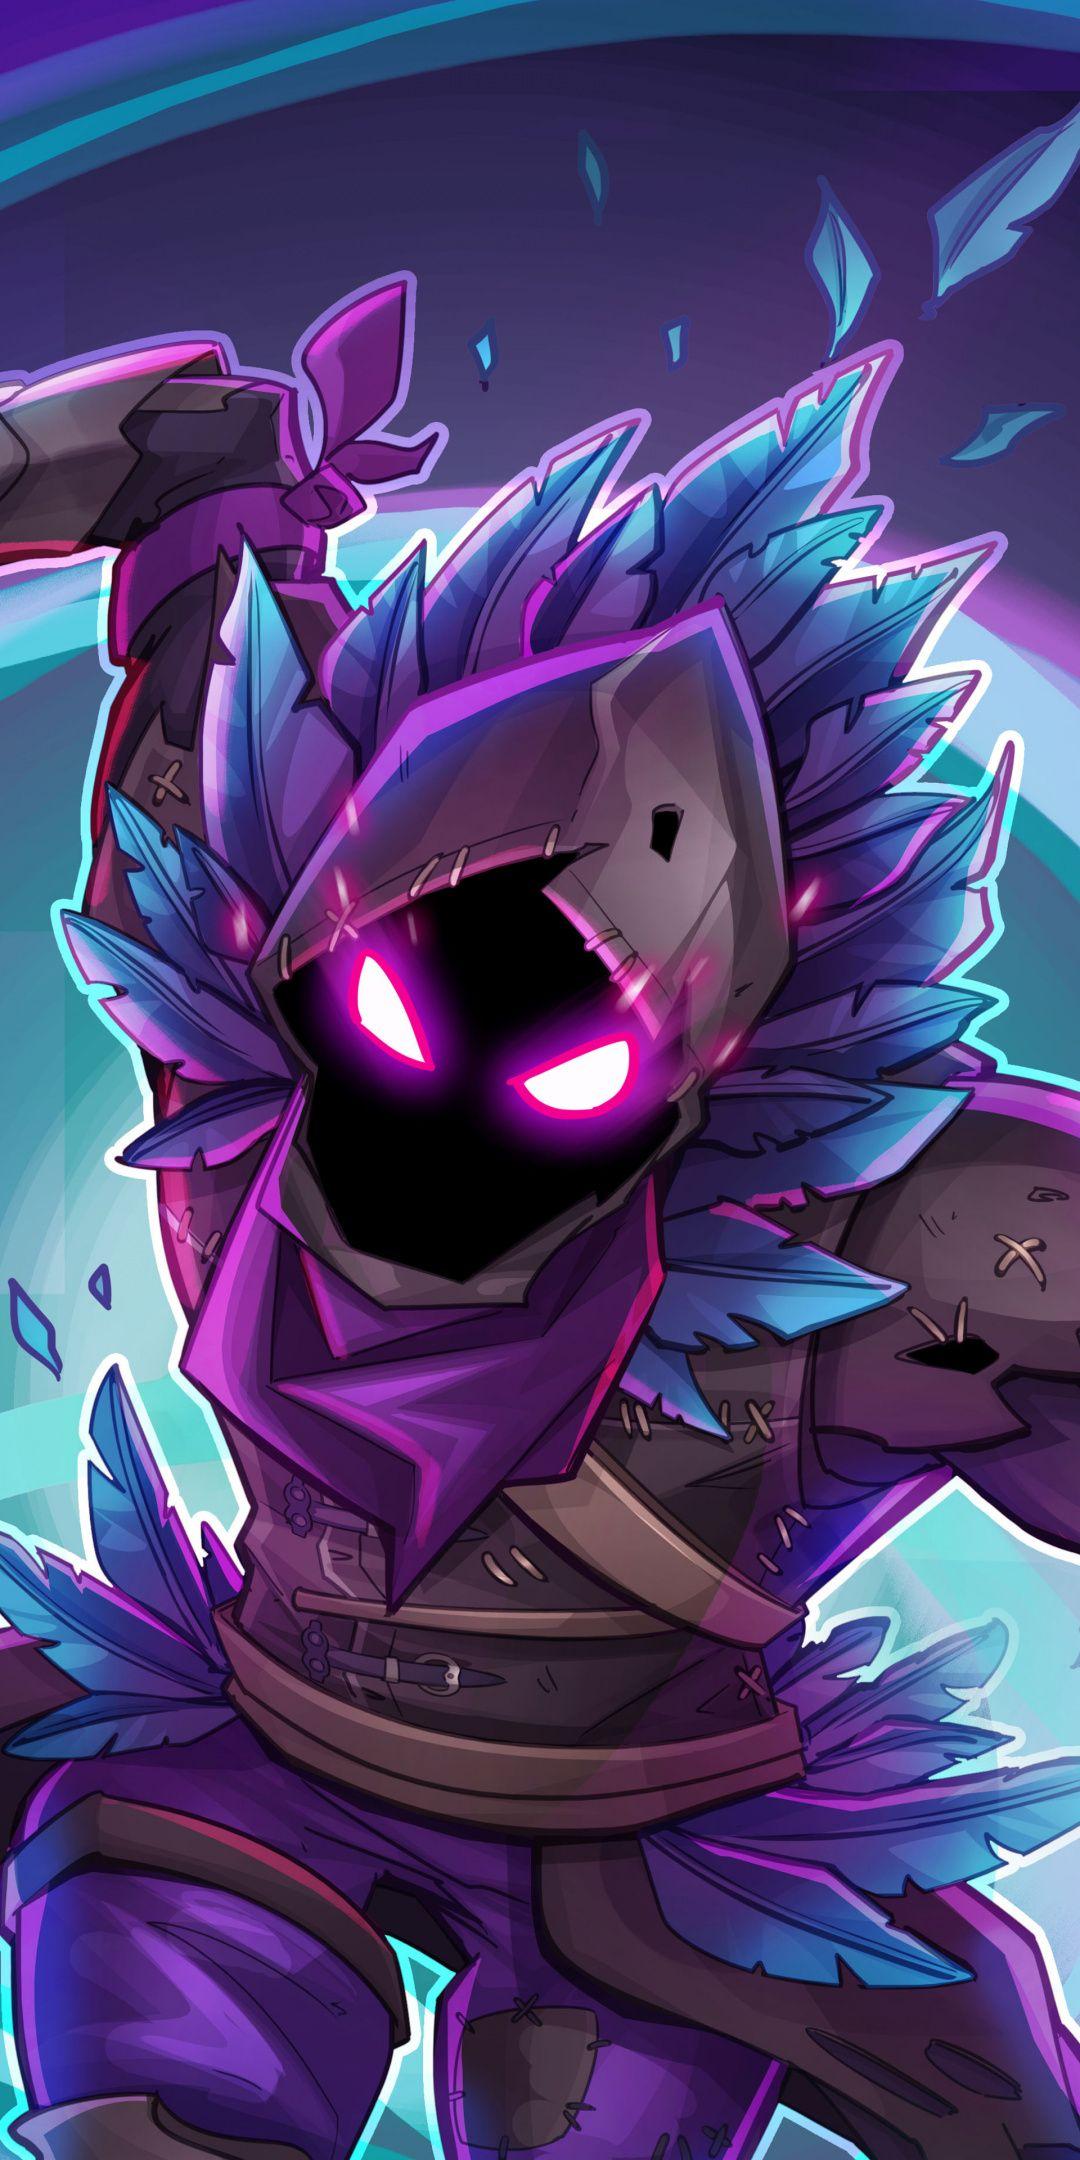 Raven Wallpaper, Fortnite Battle Royale, Creature, Game